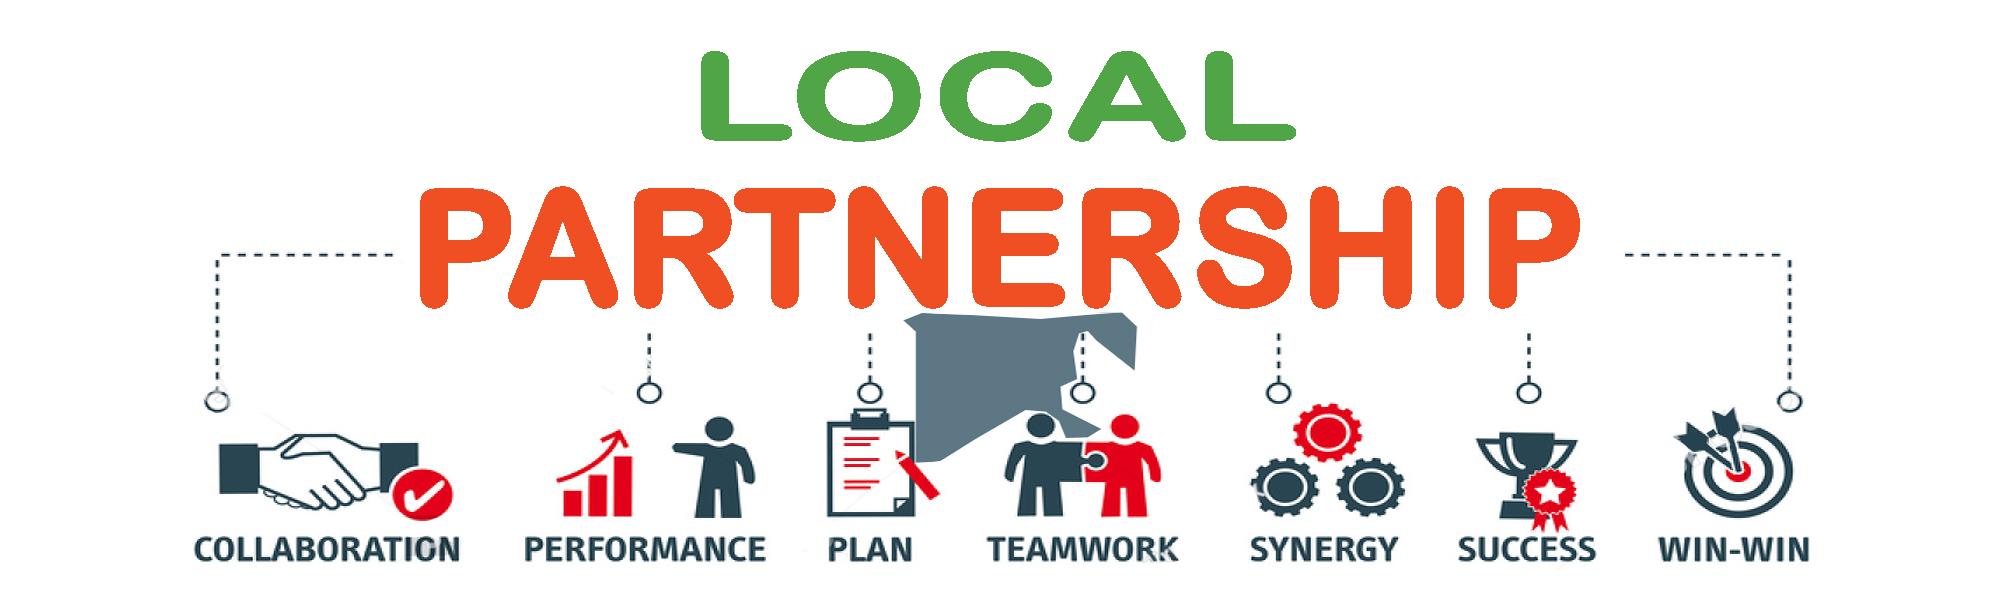 Local Partnership